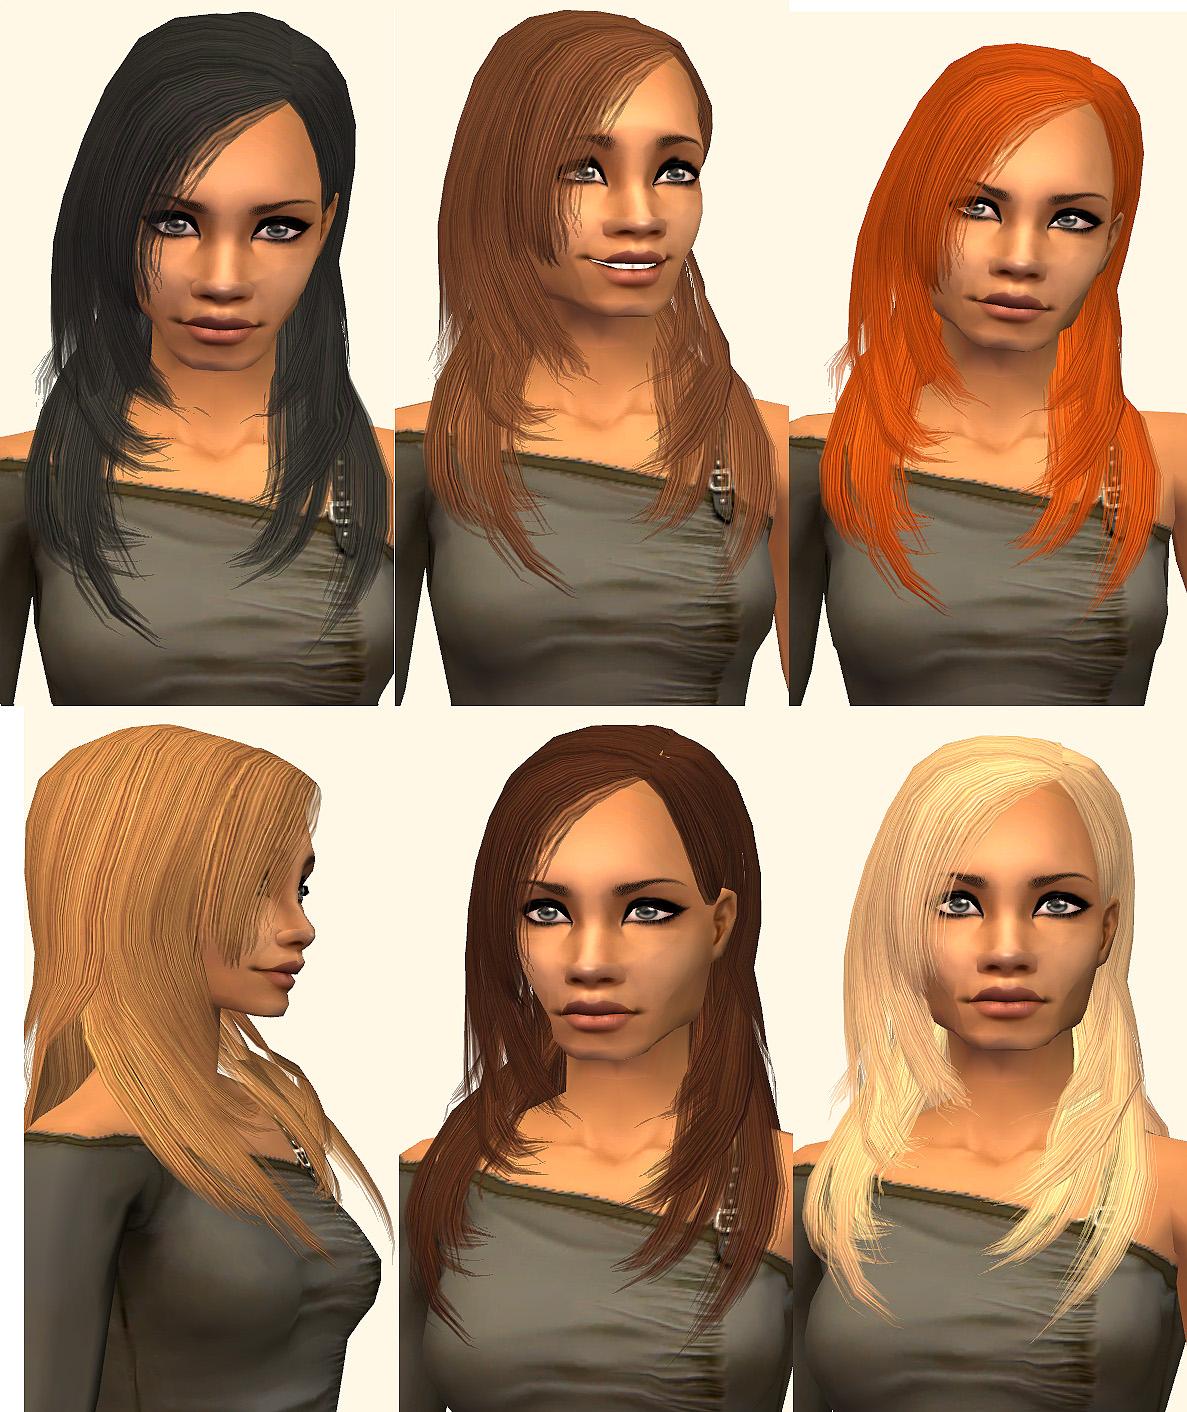 Sims 2 Hairstyles: 2 Hair Retextures